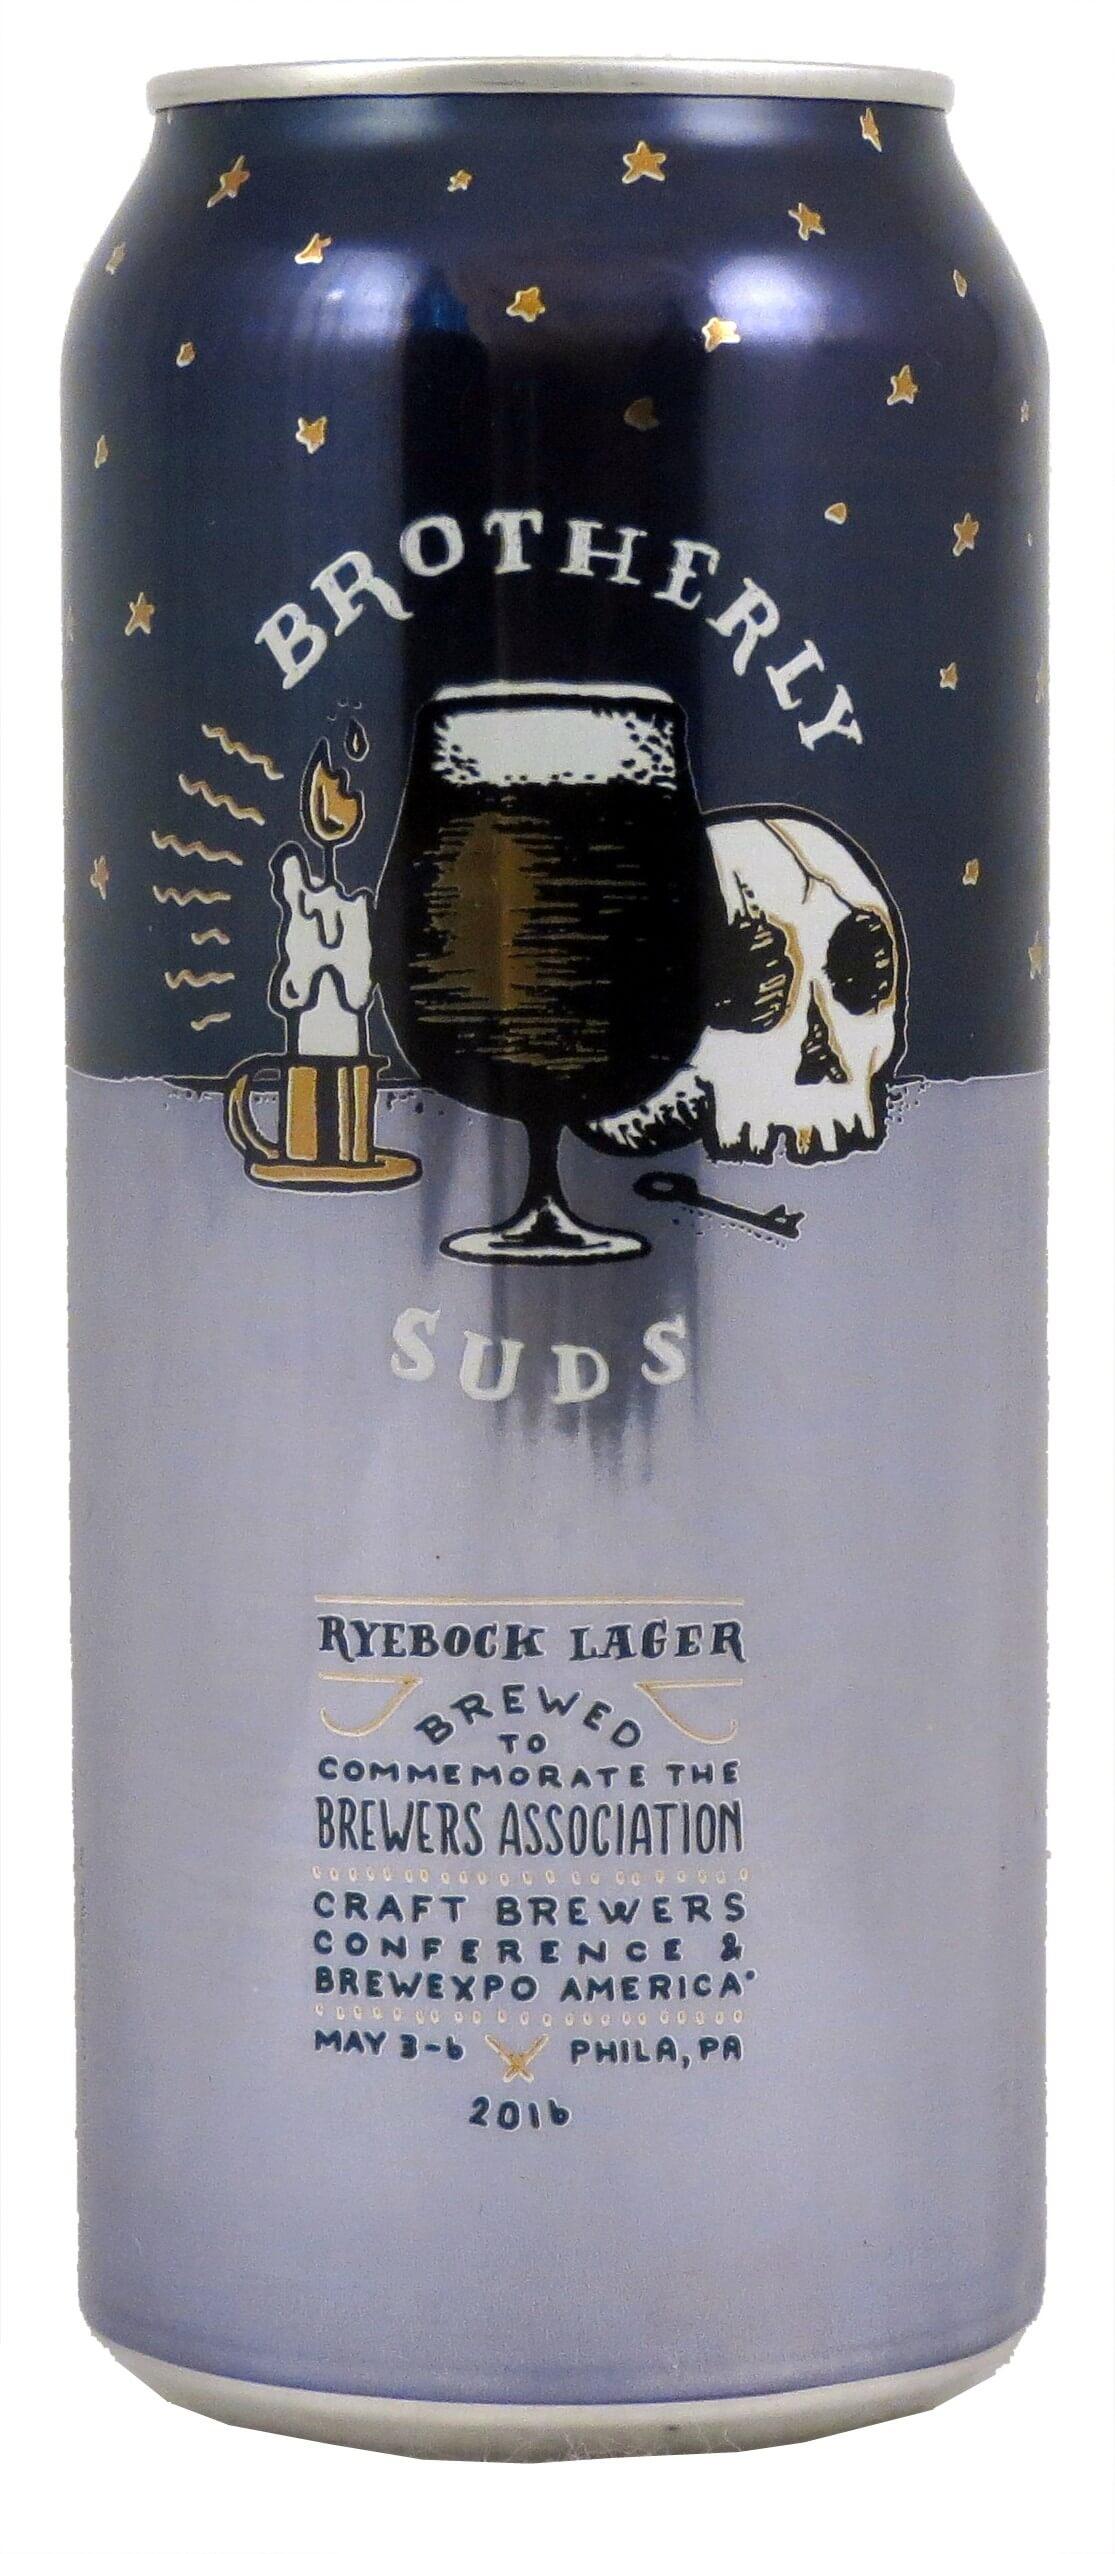 Brotherly-Sudssummer-beers